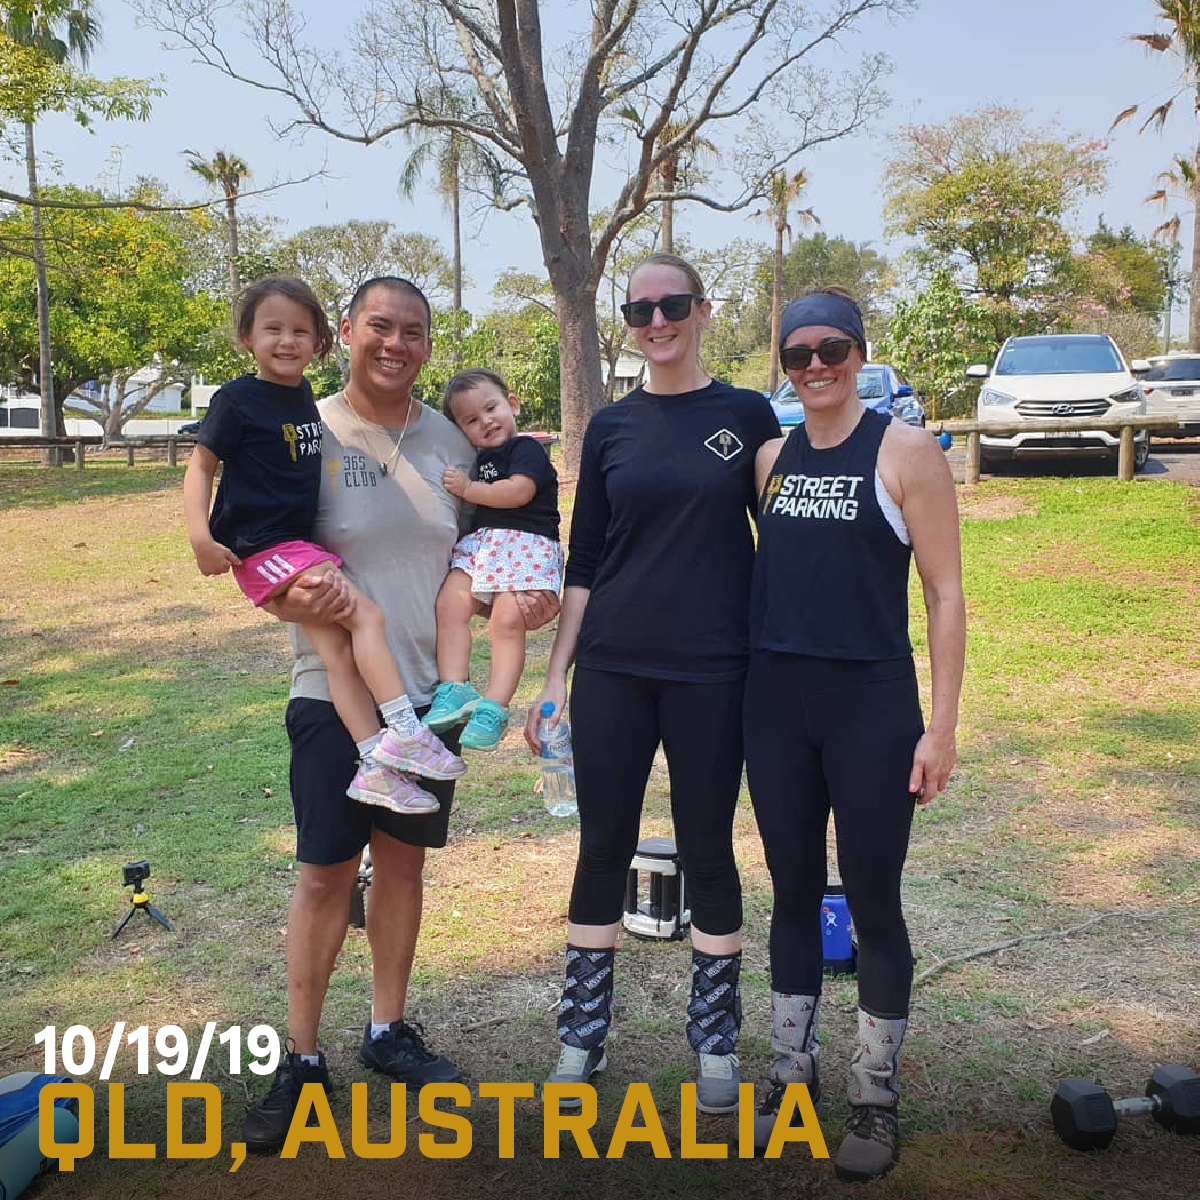 Oct 19, 2019 | Australia